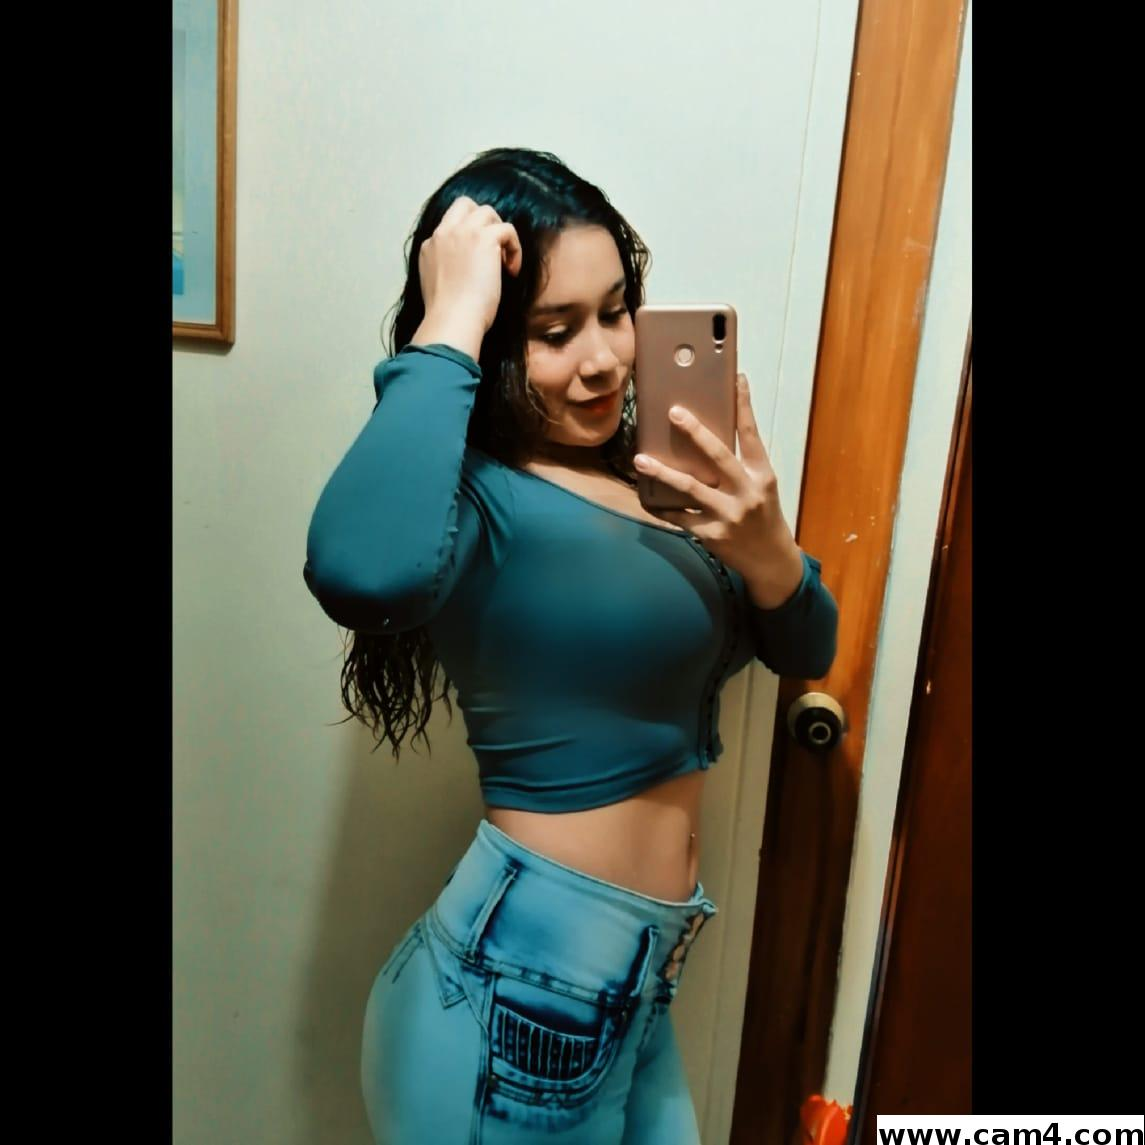 Samantha3 ?s=qdcbcxjxnumlrcbcqchod0istmqrcjiqx2hazka2sx4=